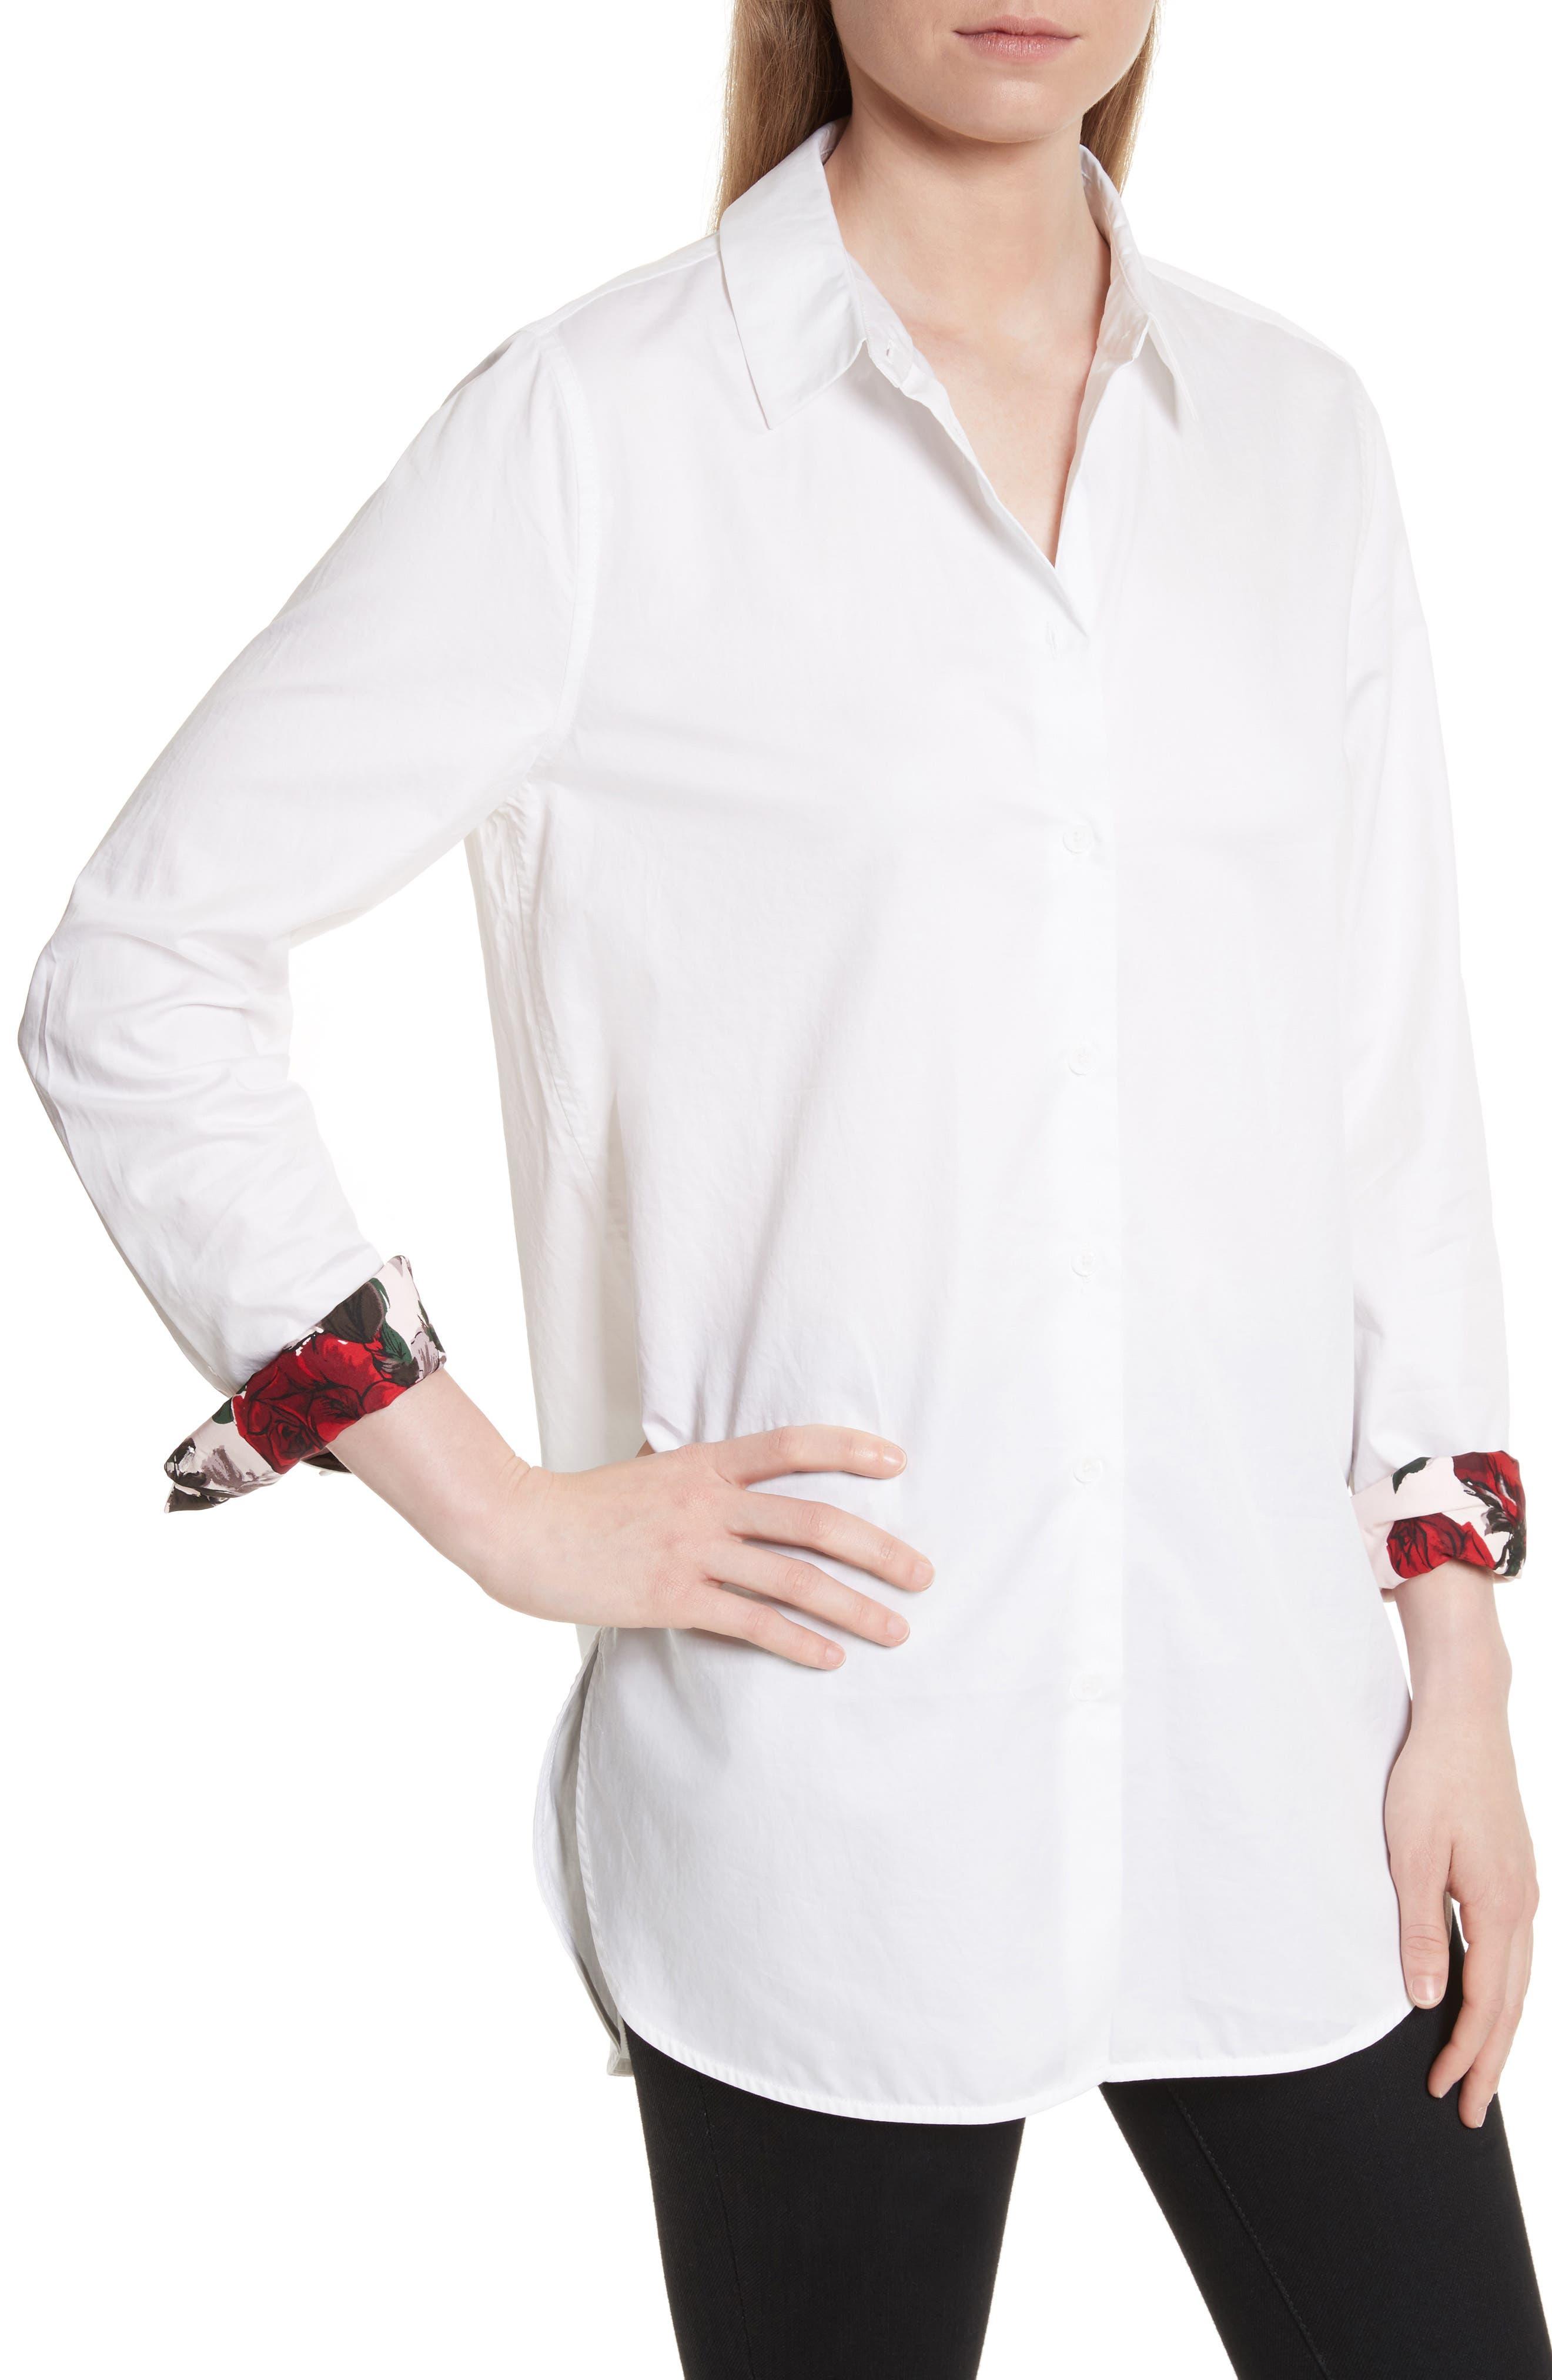 Arlette Cotton Shirt,                             Alternate thumbnail 4, color,                             Bright White